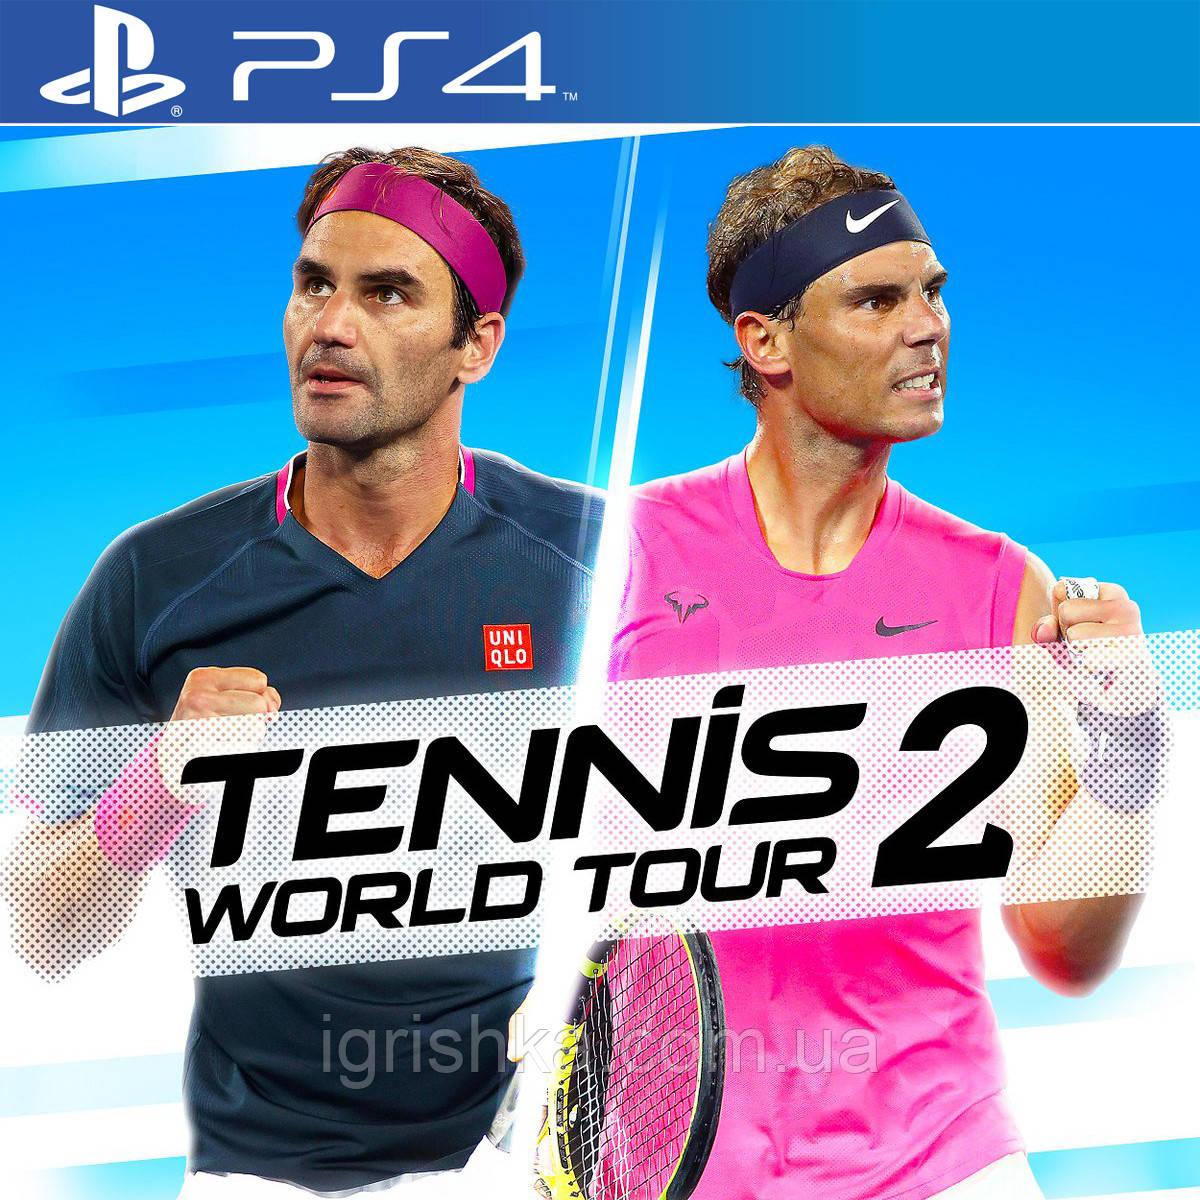 Tennis World Tour 2 Ps4 (Цифровой аккаунт для PlayStation 4) П3